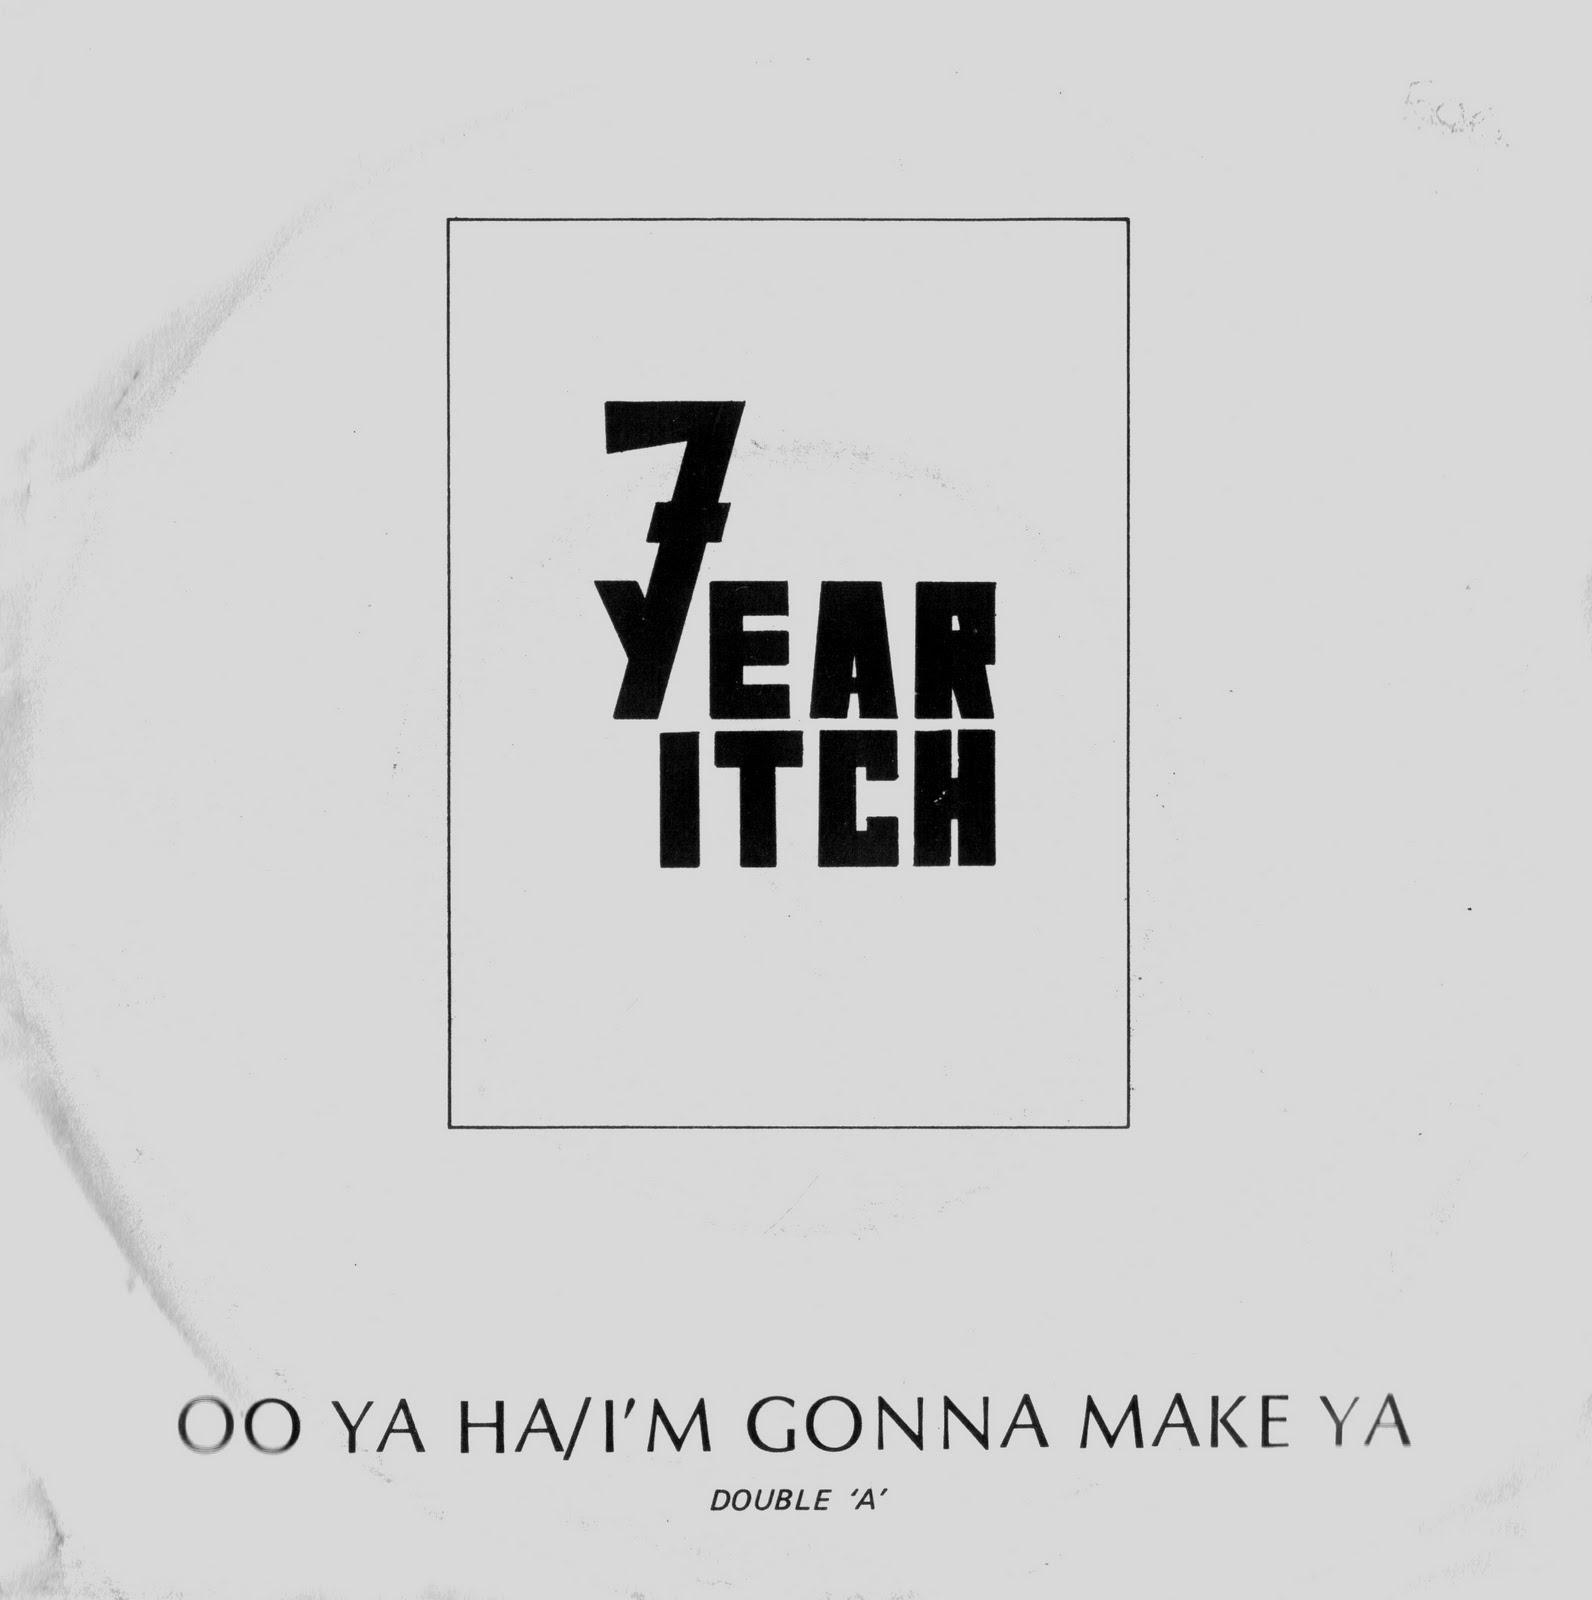 7 Year Itch (UK) - Oo Ya Ha [Single] (1980) 7year